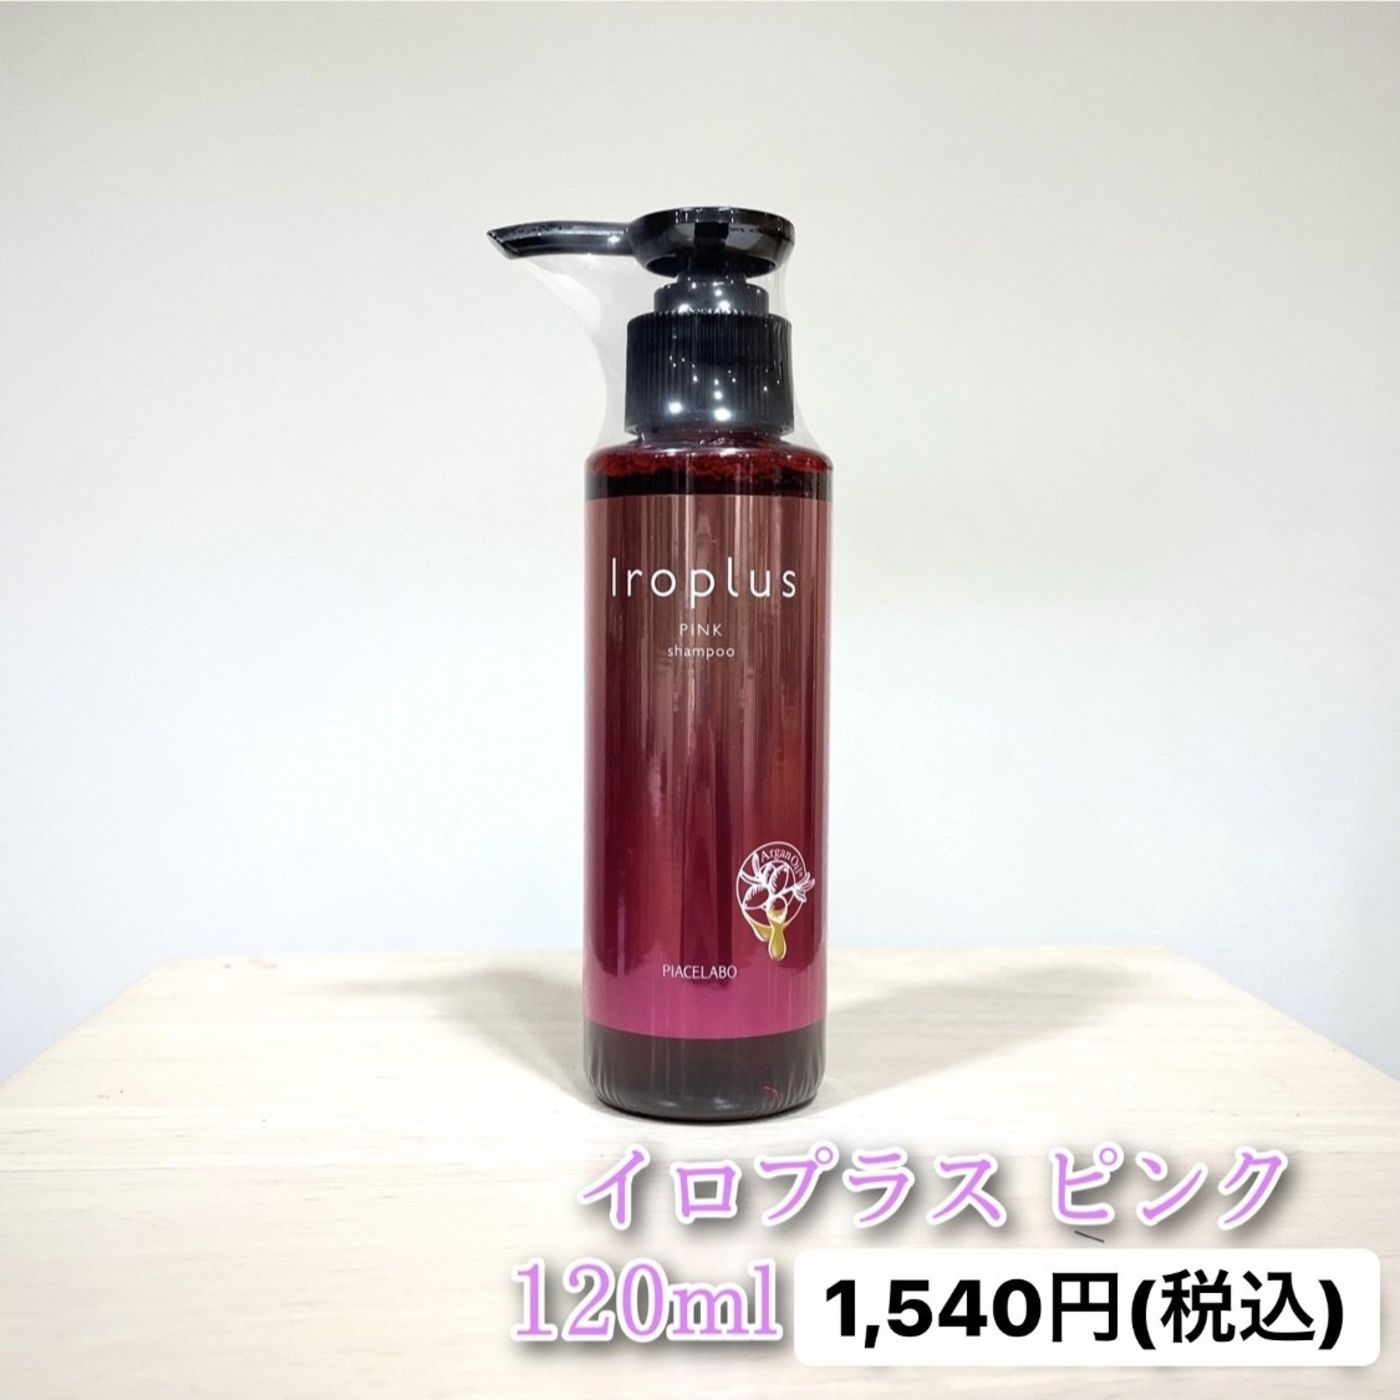 Iroplus【イロプラス】 ピンク